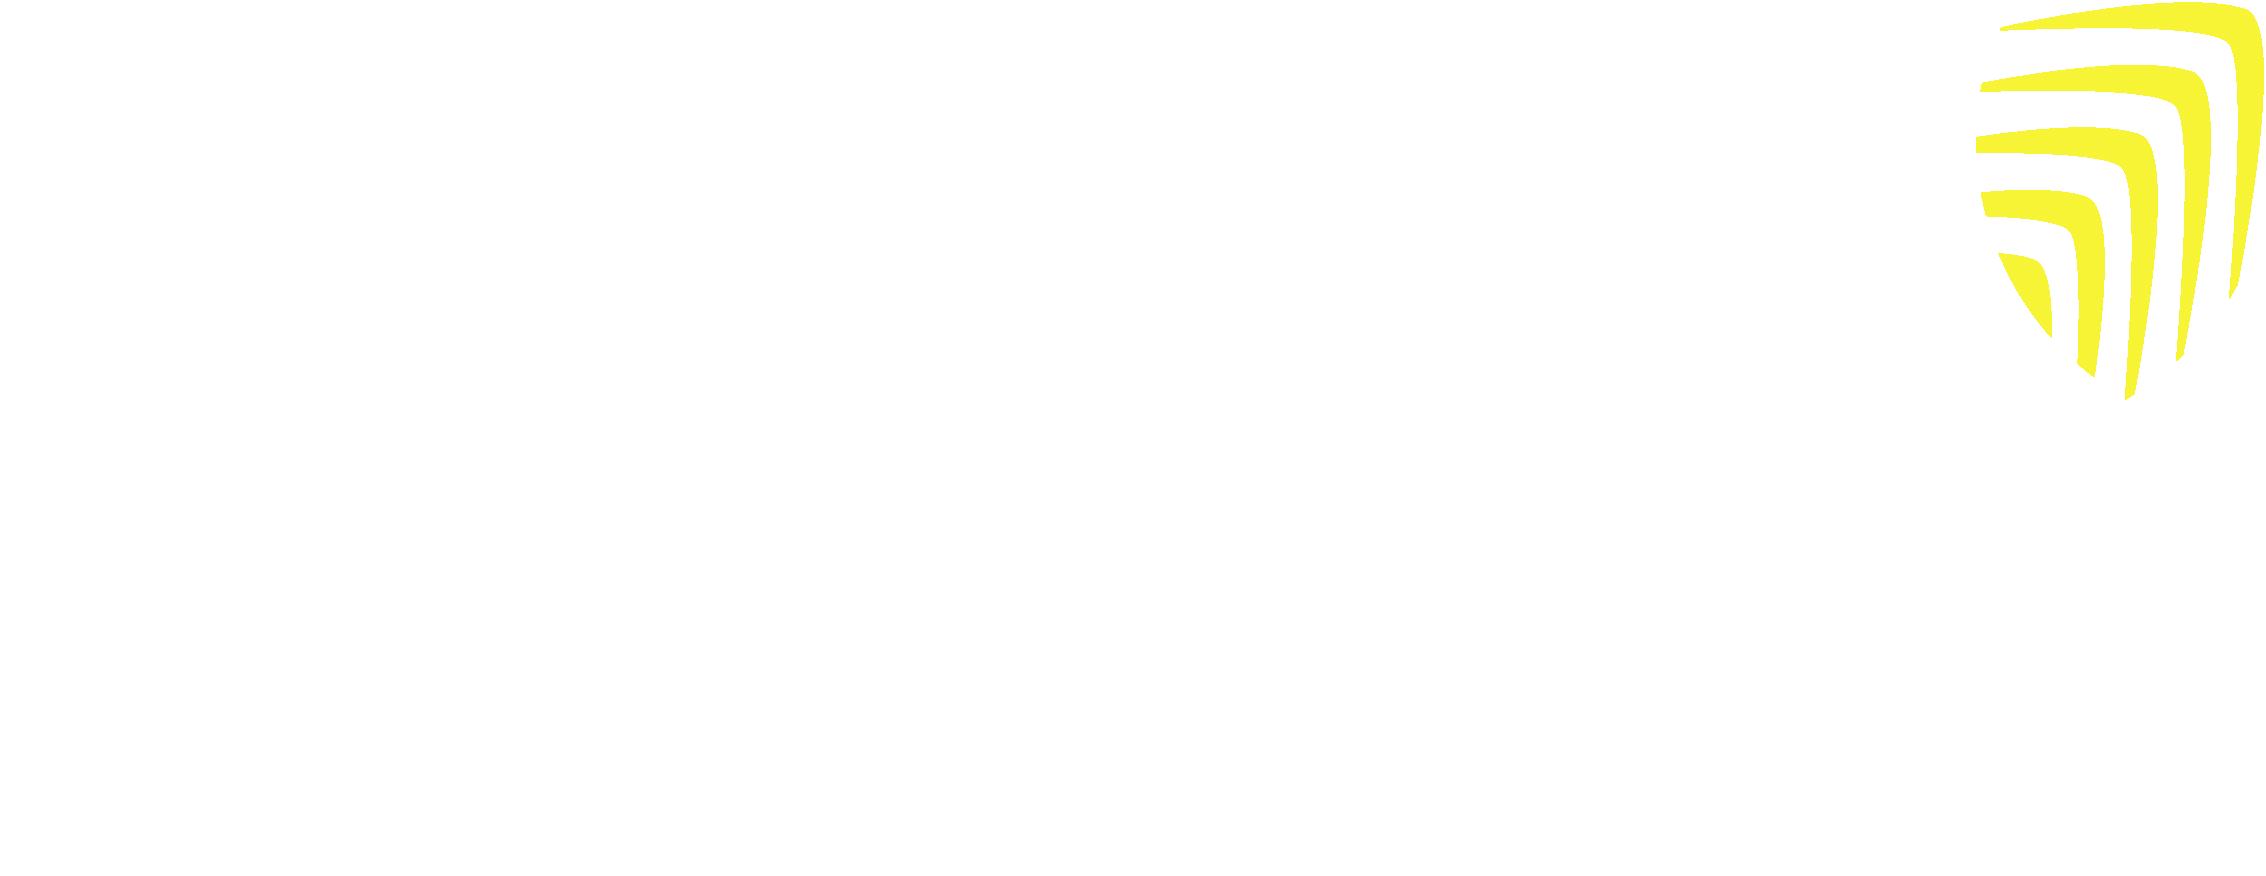 Ba-Detect